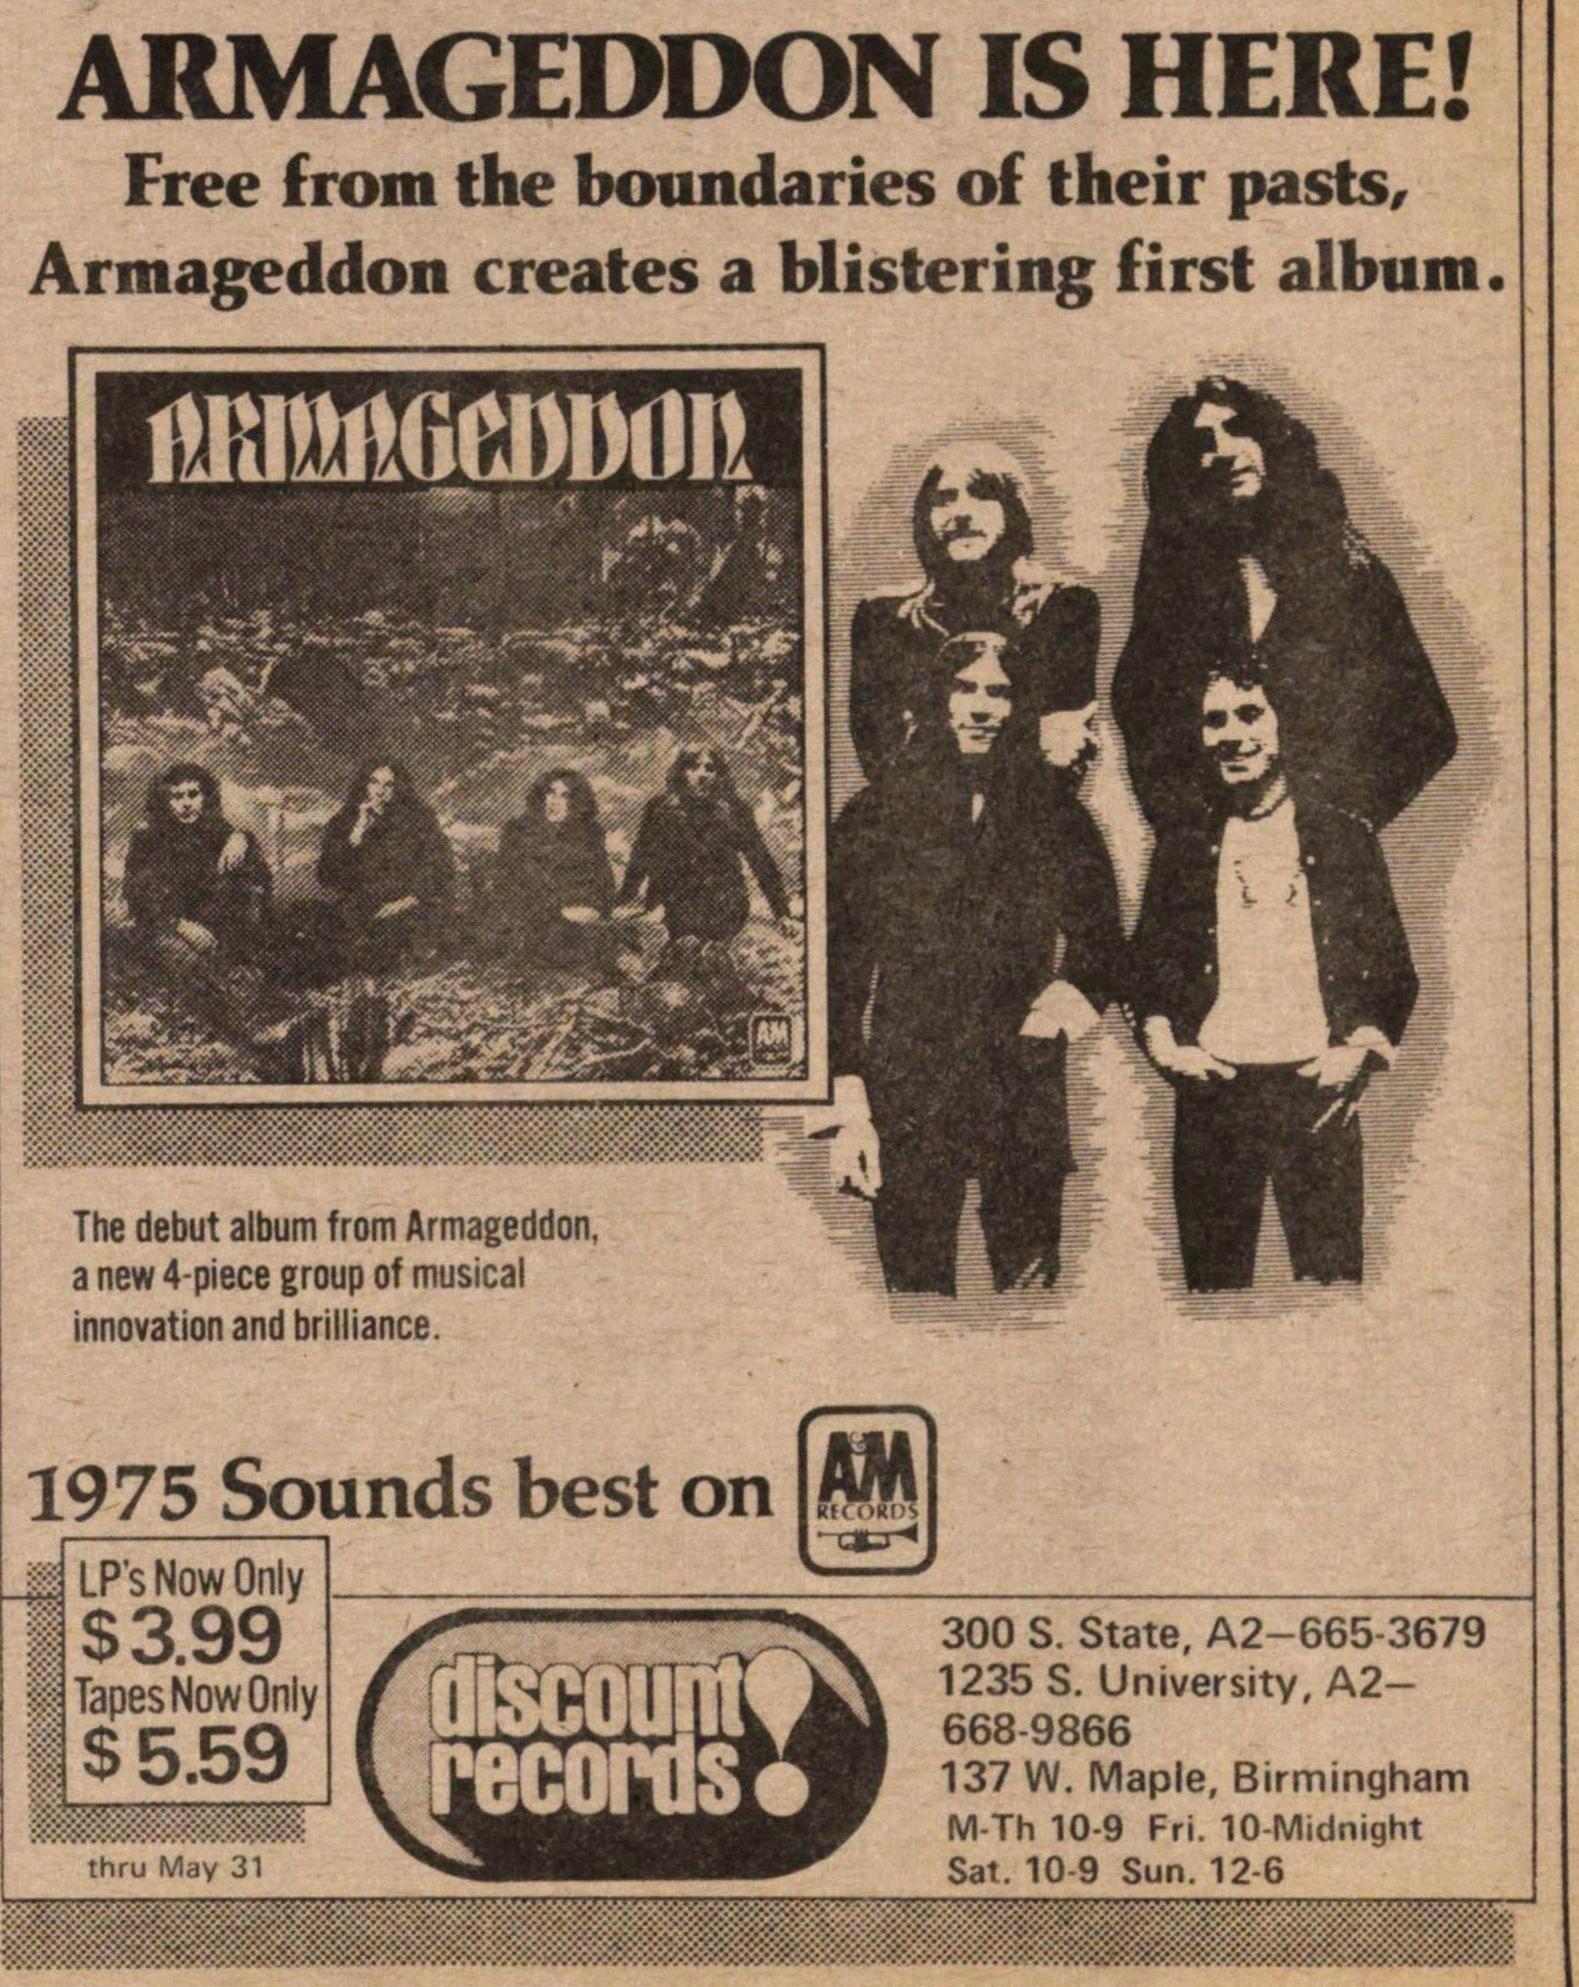 Armageddonad1975